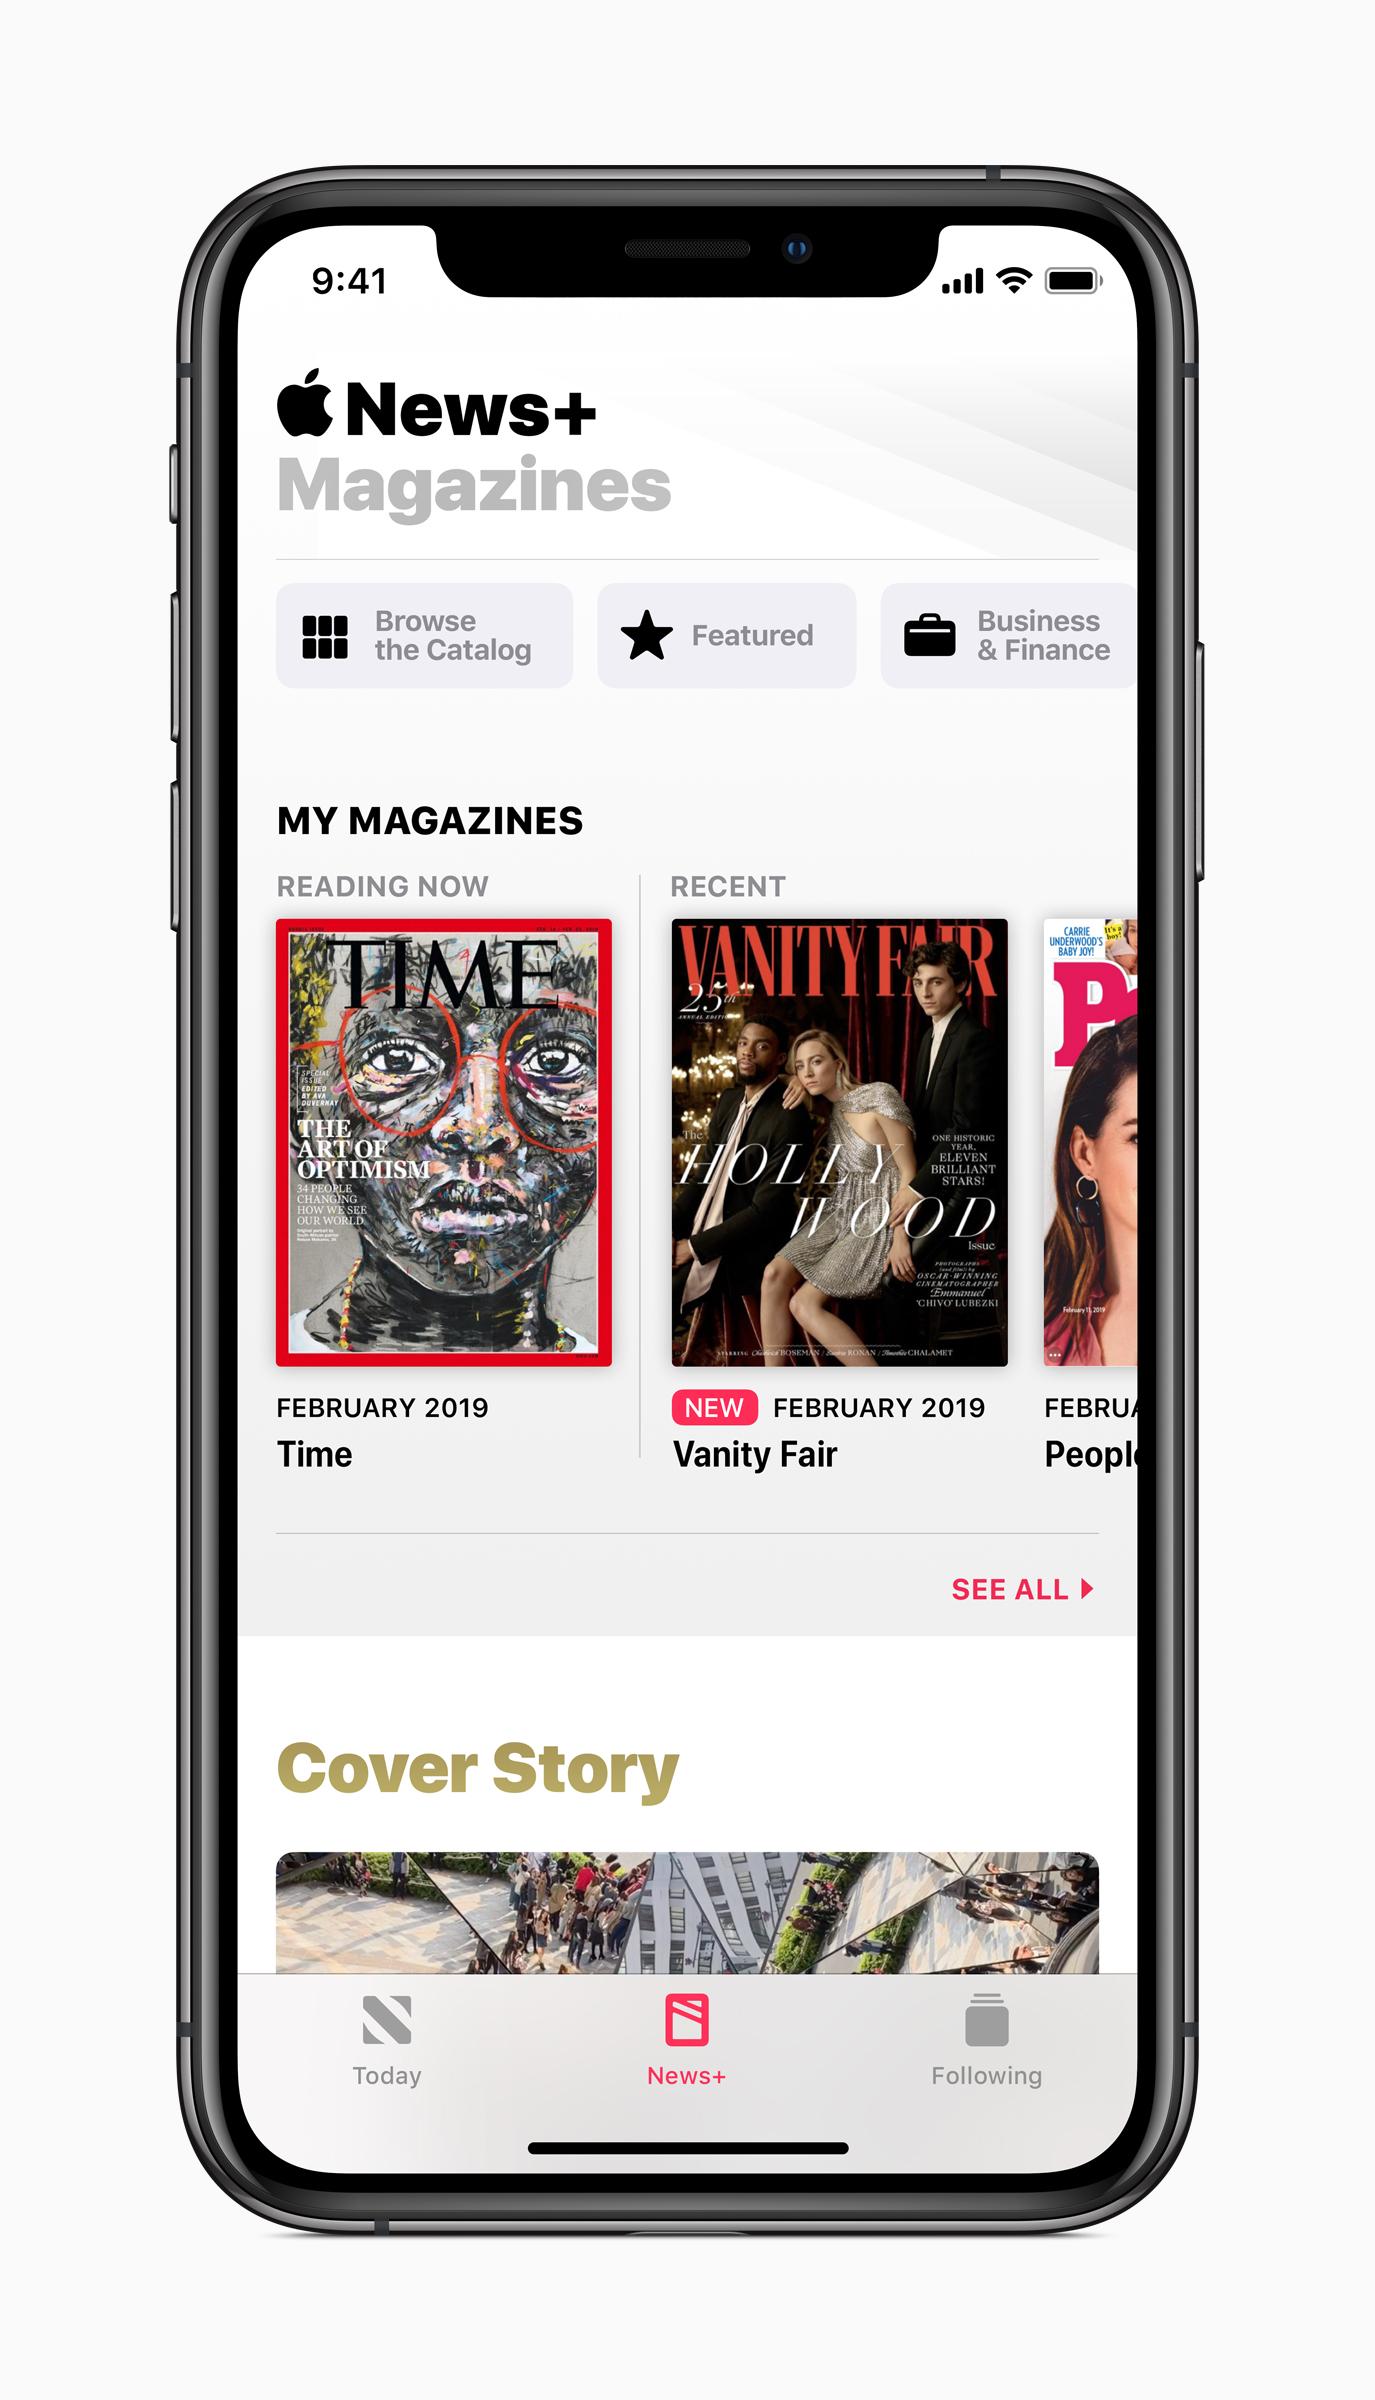 Apple news plus magazines iphone screen 03252019